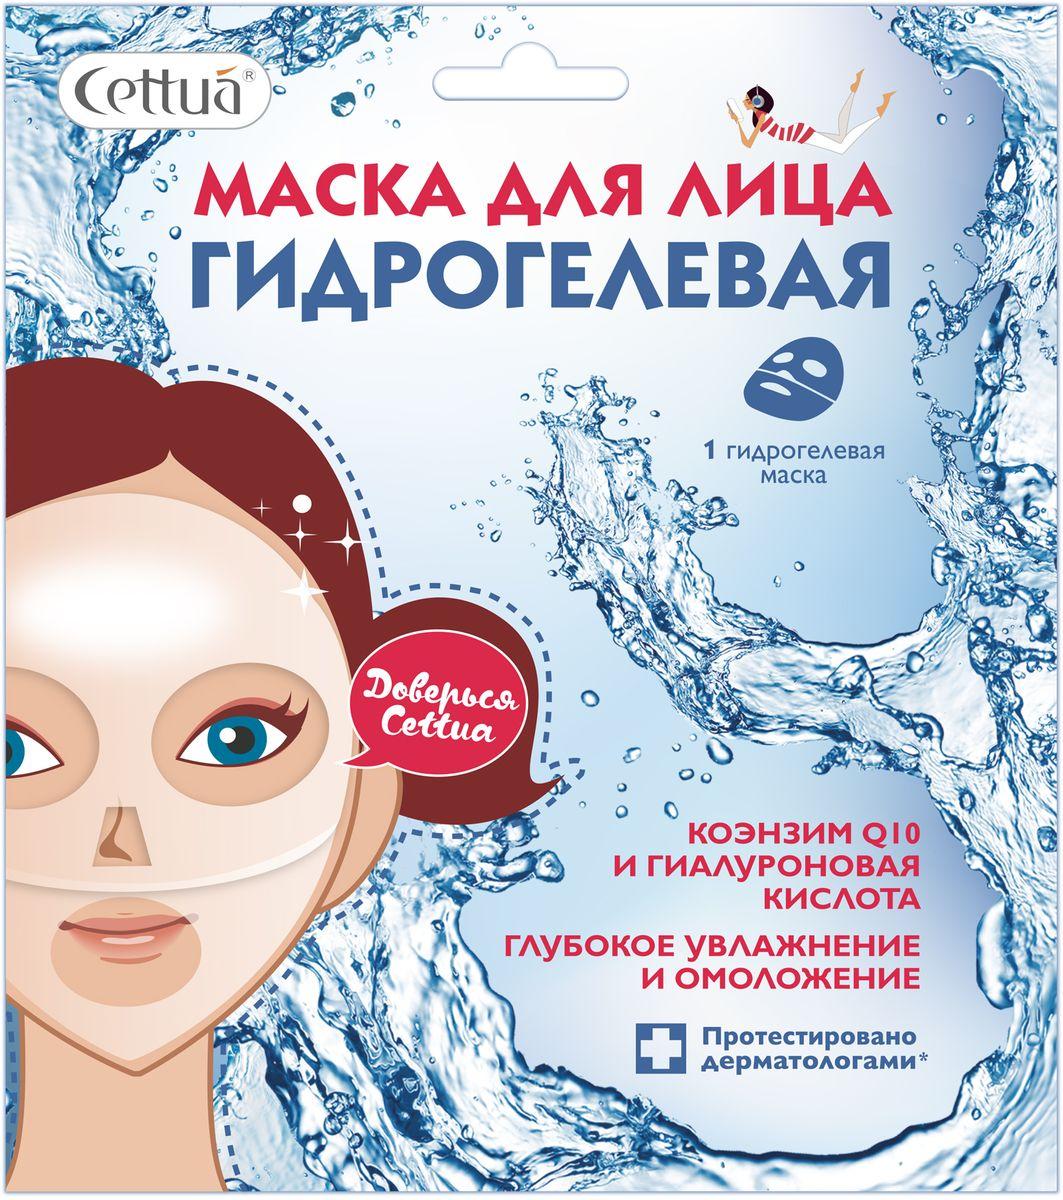 Cettua Маска для лица гидрогелевая